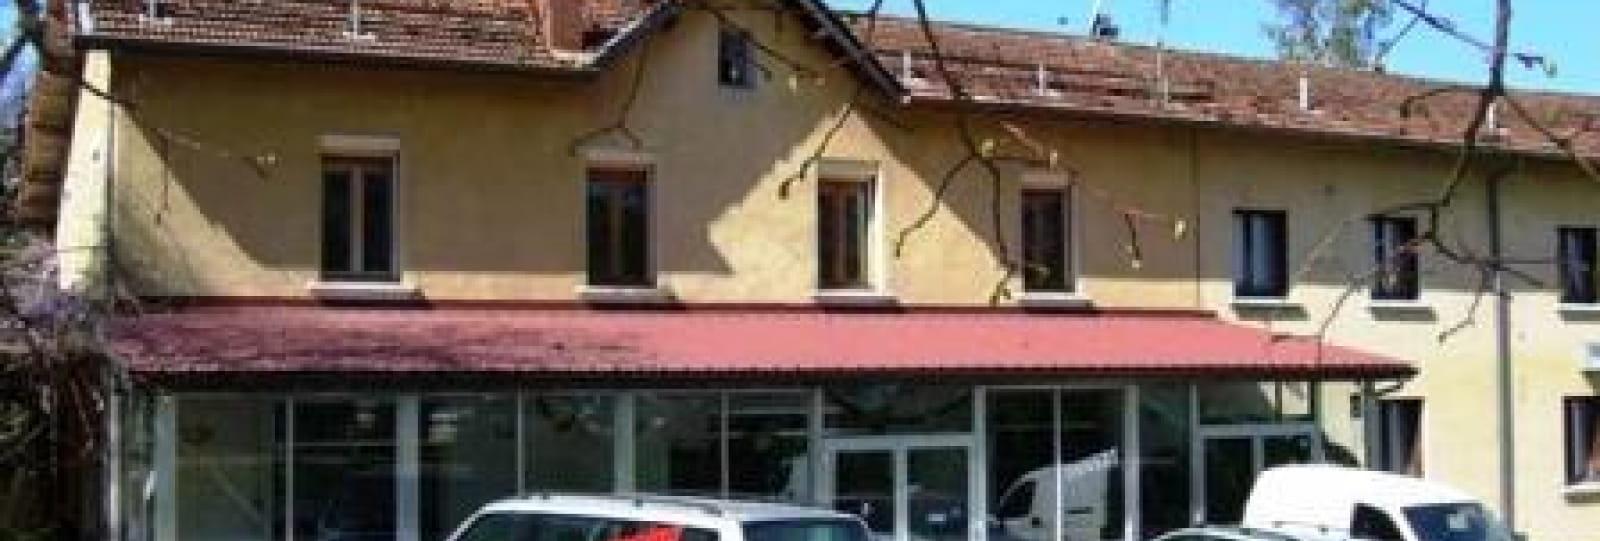 Hôtel-Restaurant du Sapin